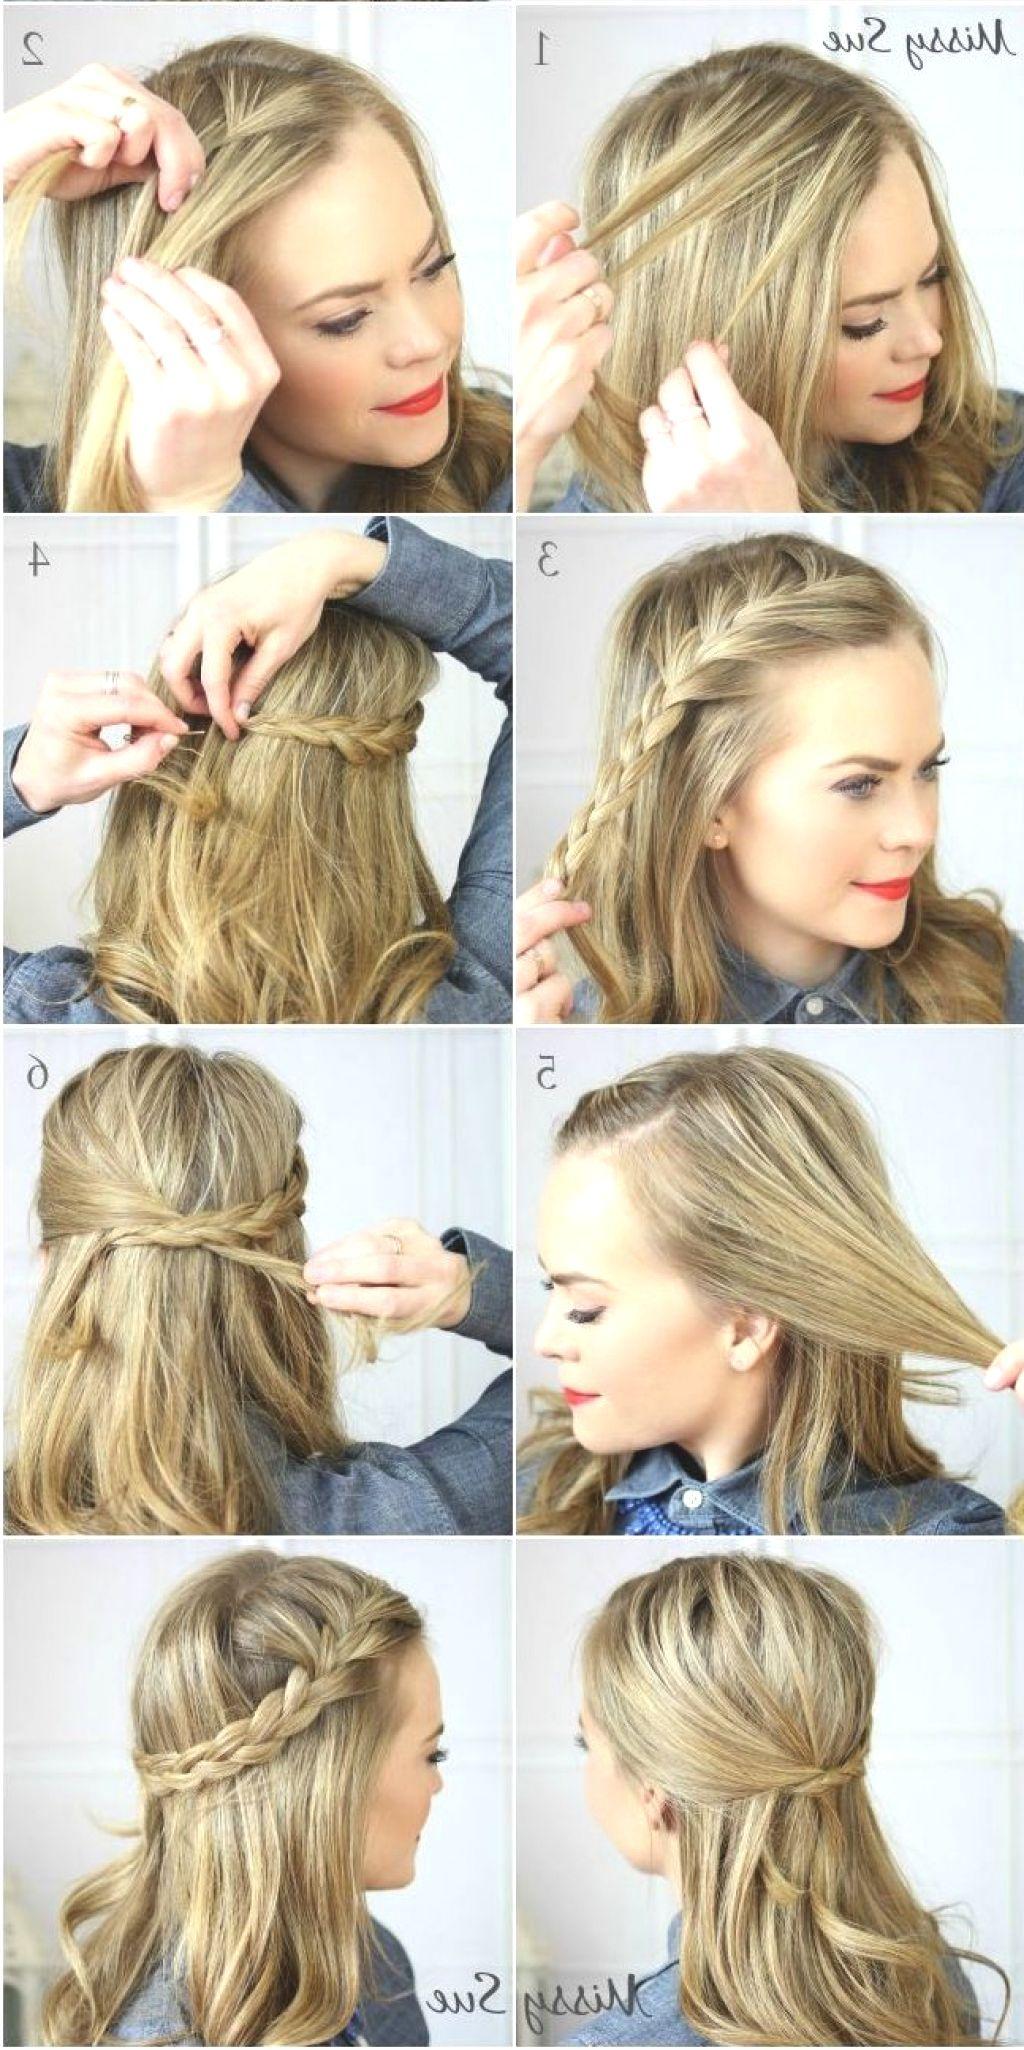 17 Darn Cool Hairstyles For Medium Length Hair Step By Step Easy Hairstyles Medium Hair Styles Medium Length Hair Styles